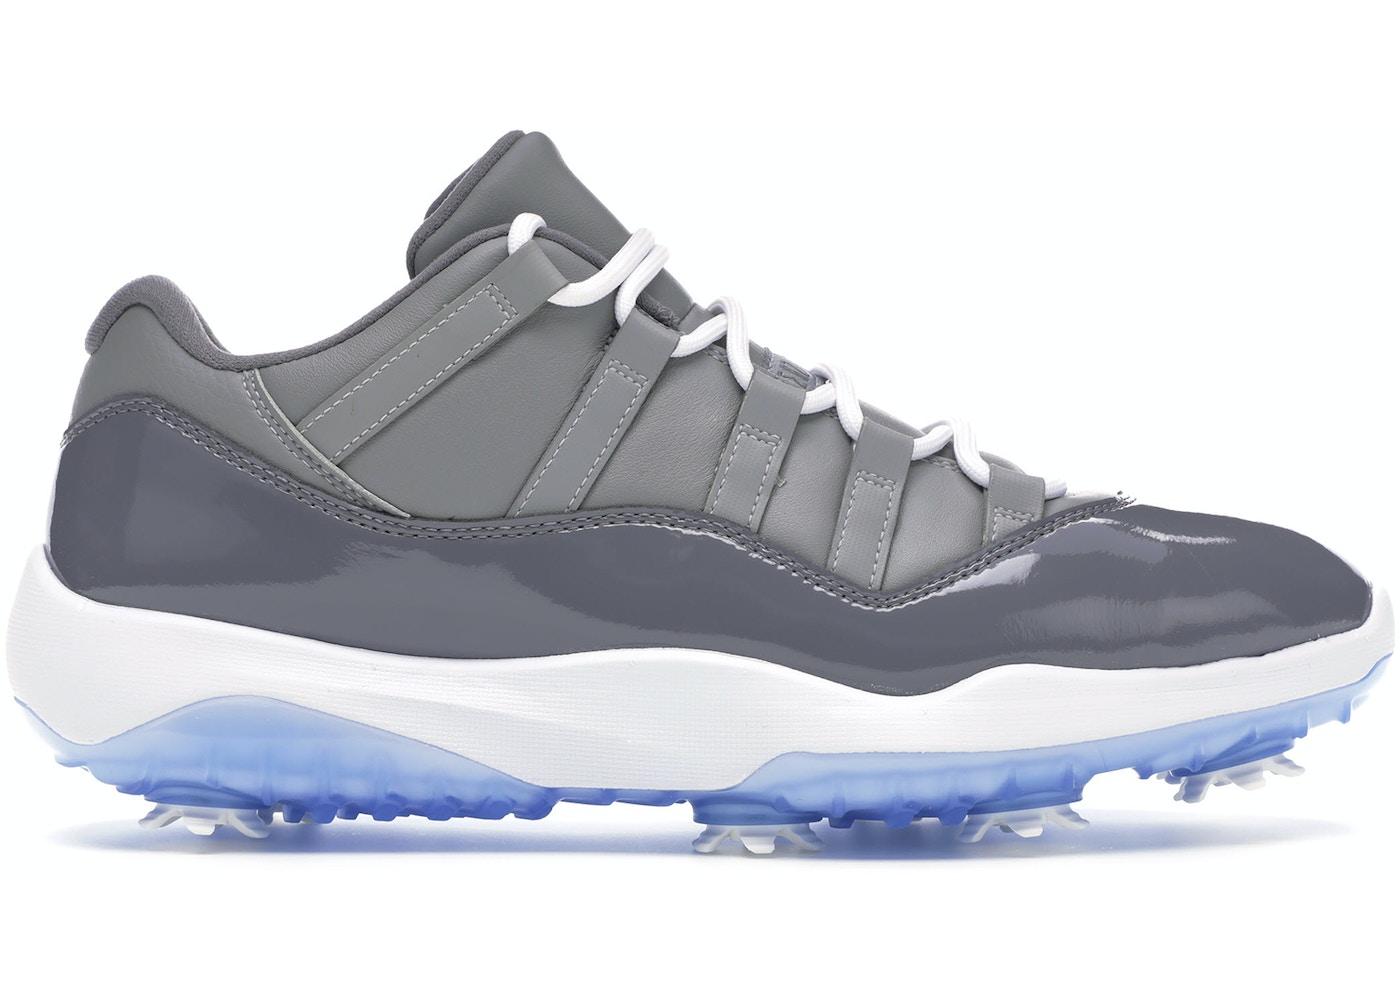 Jordan 11 Retro Low Golf Cool Grey Aq0963 002